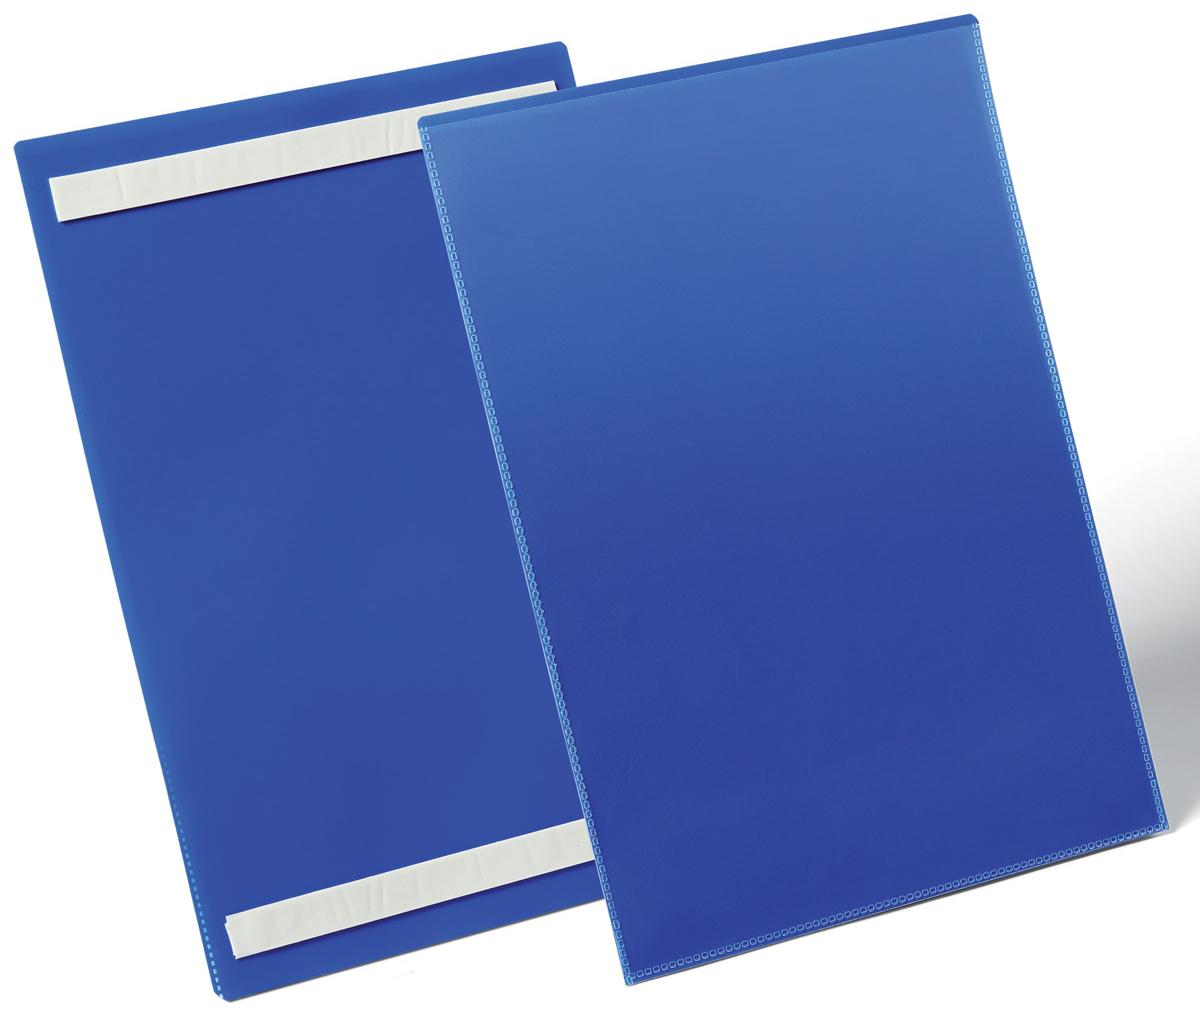 Durable Карман cамоклеящийся для маркировки цвет синий 1797-07 -  Папки